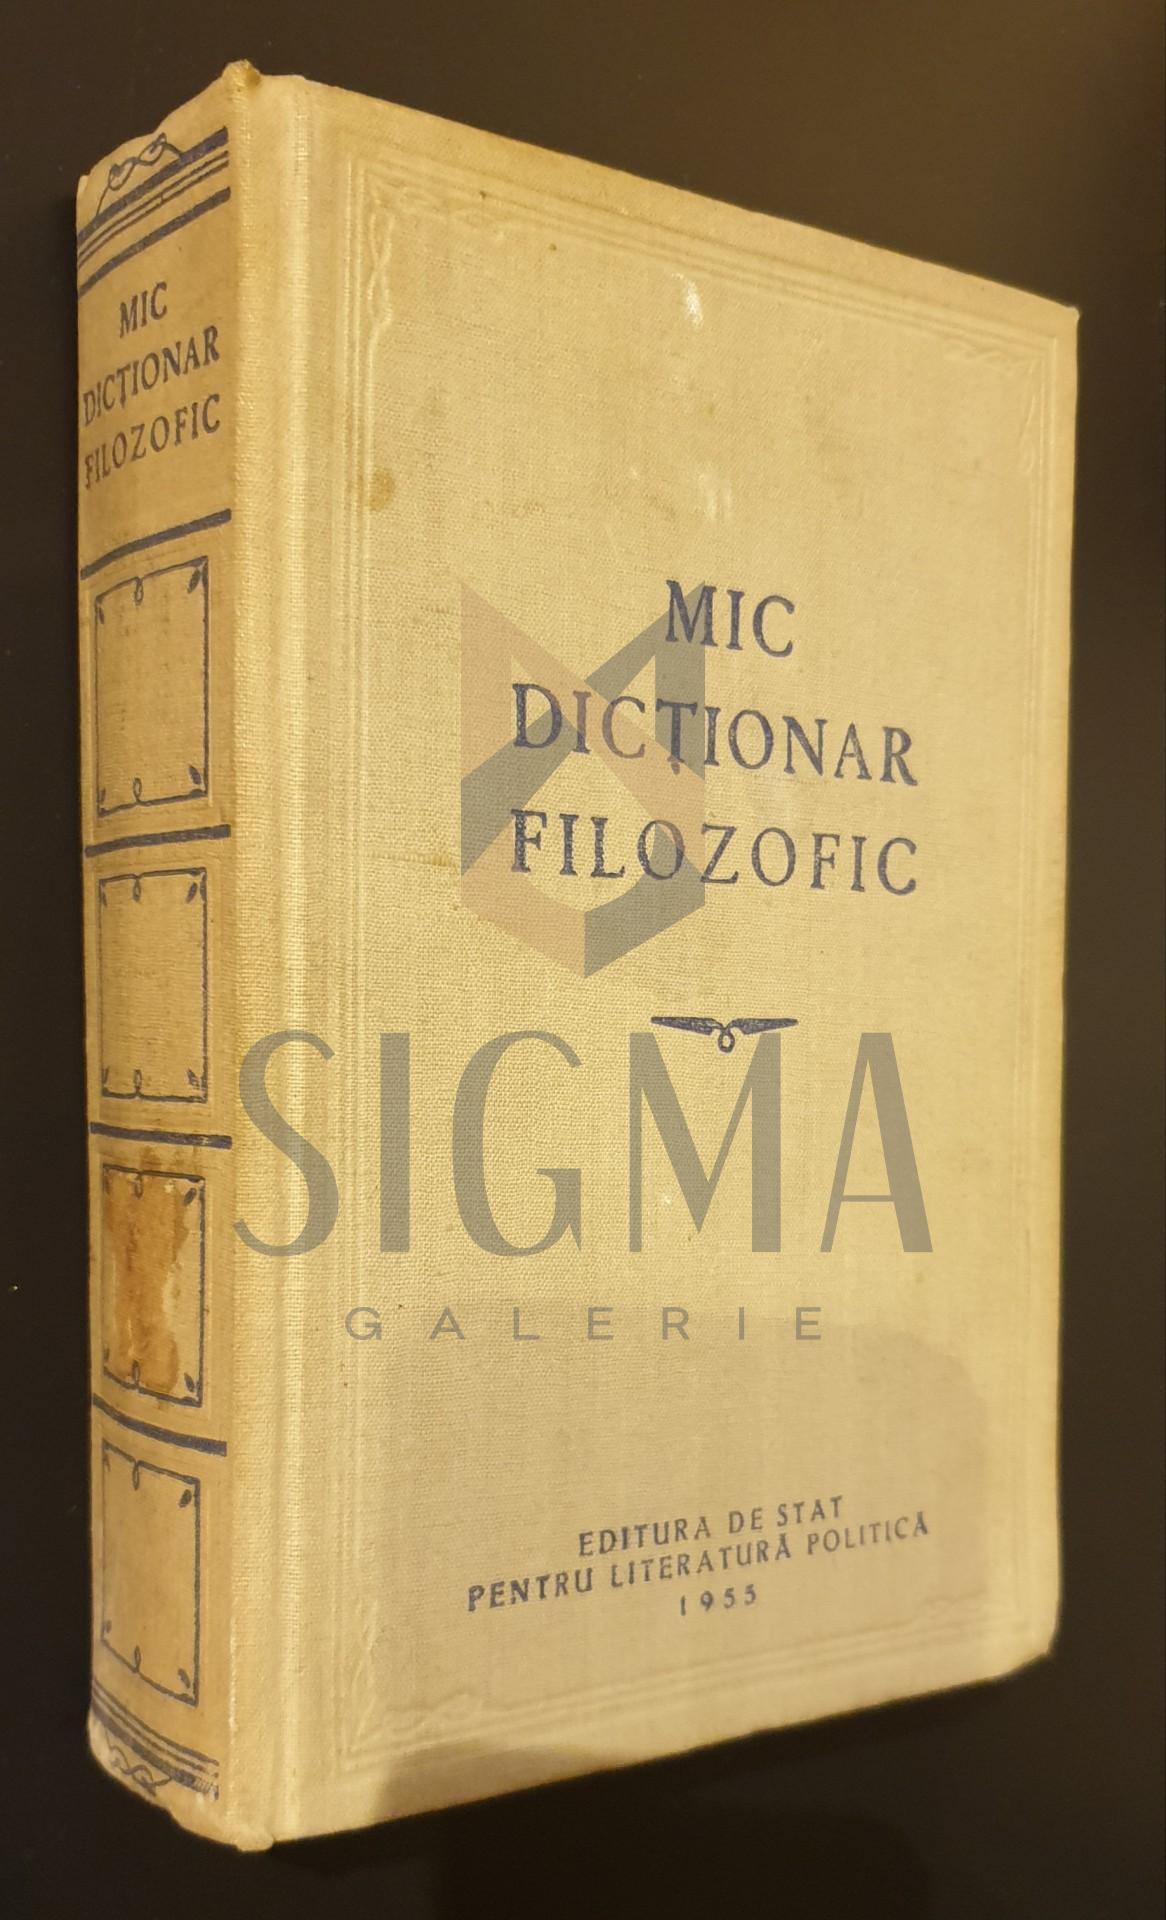 Mic dictionar filozofic